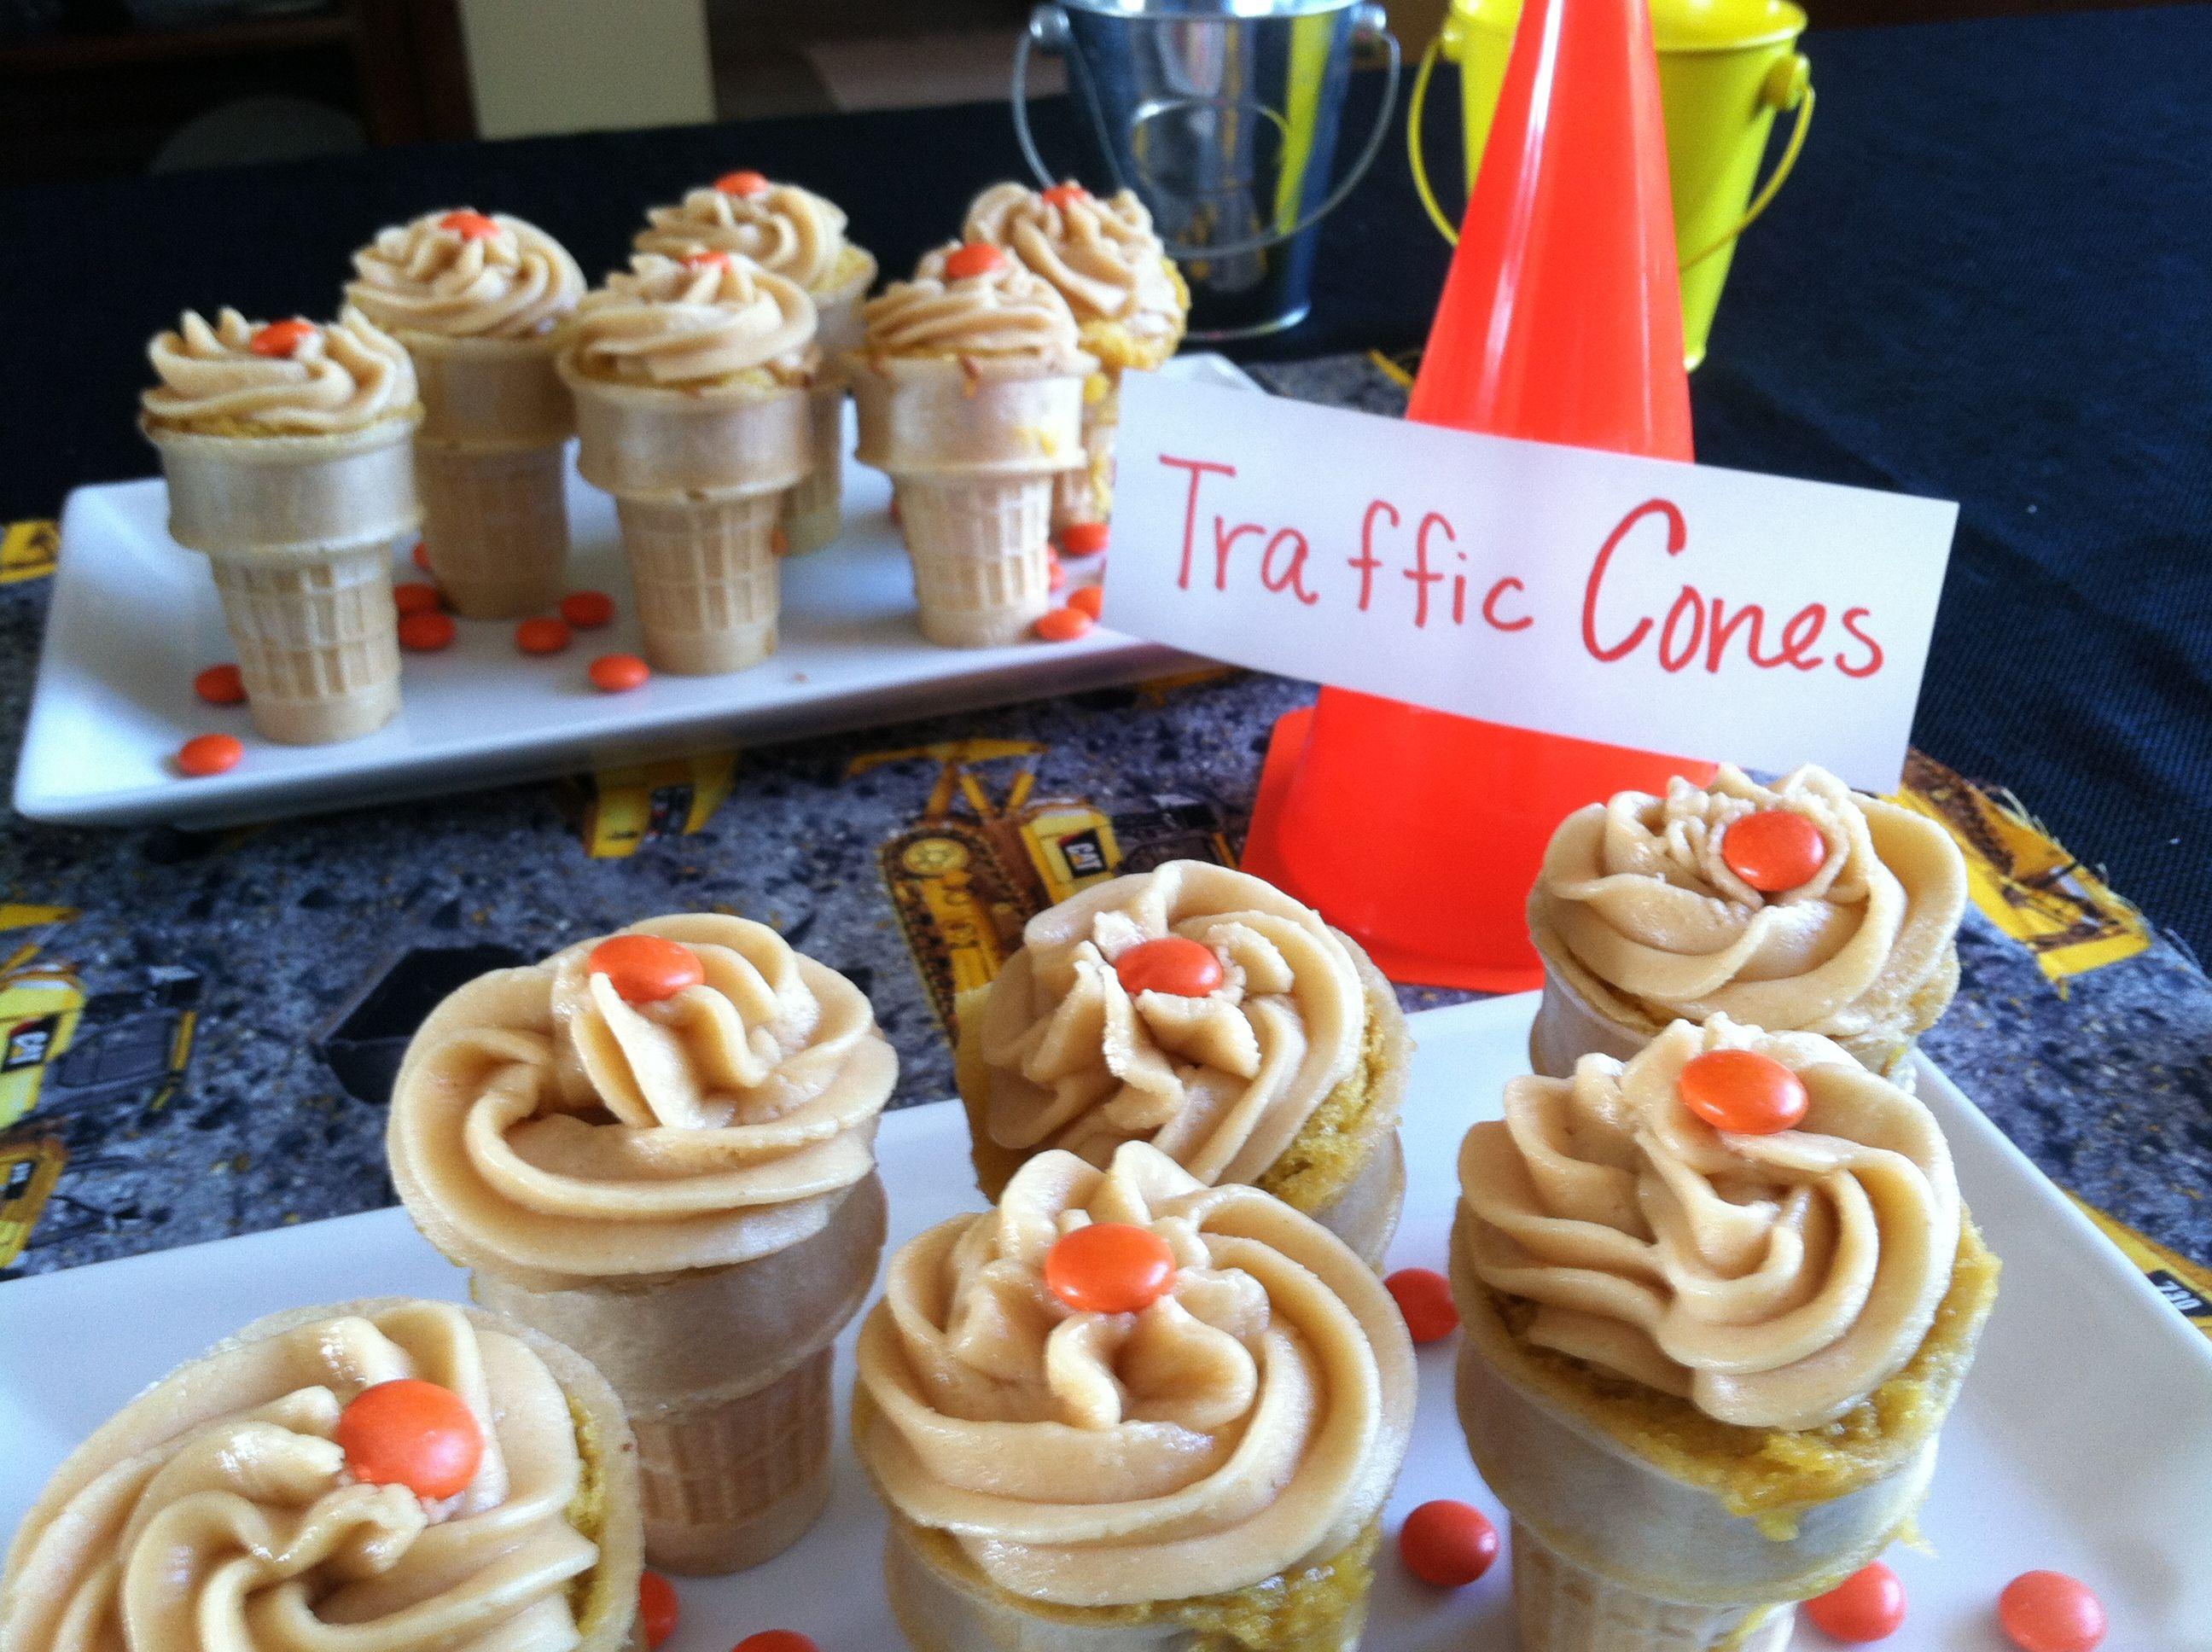 Traffic Cones Cupcakes Baked In Ice Cream Cones Construction